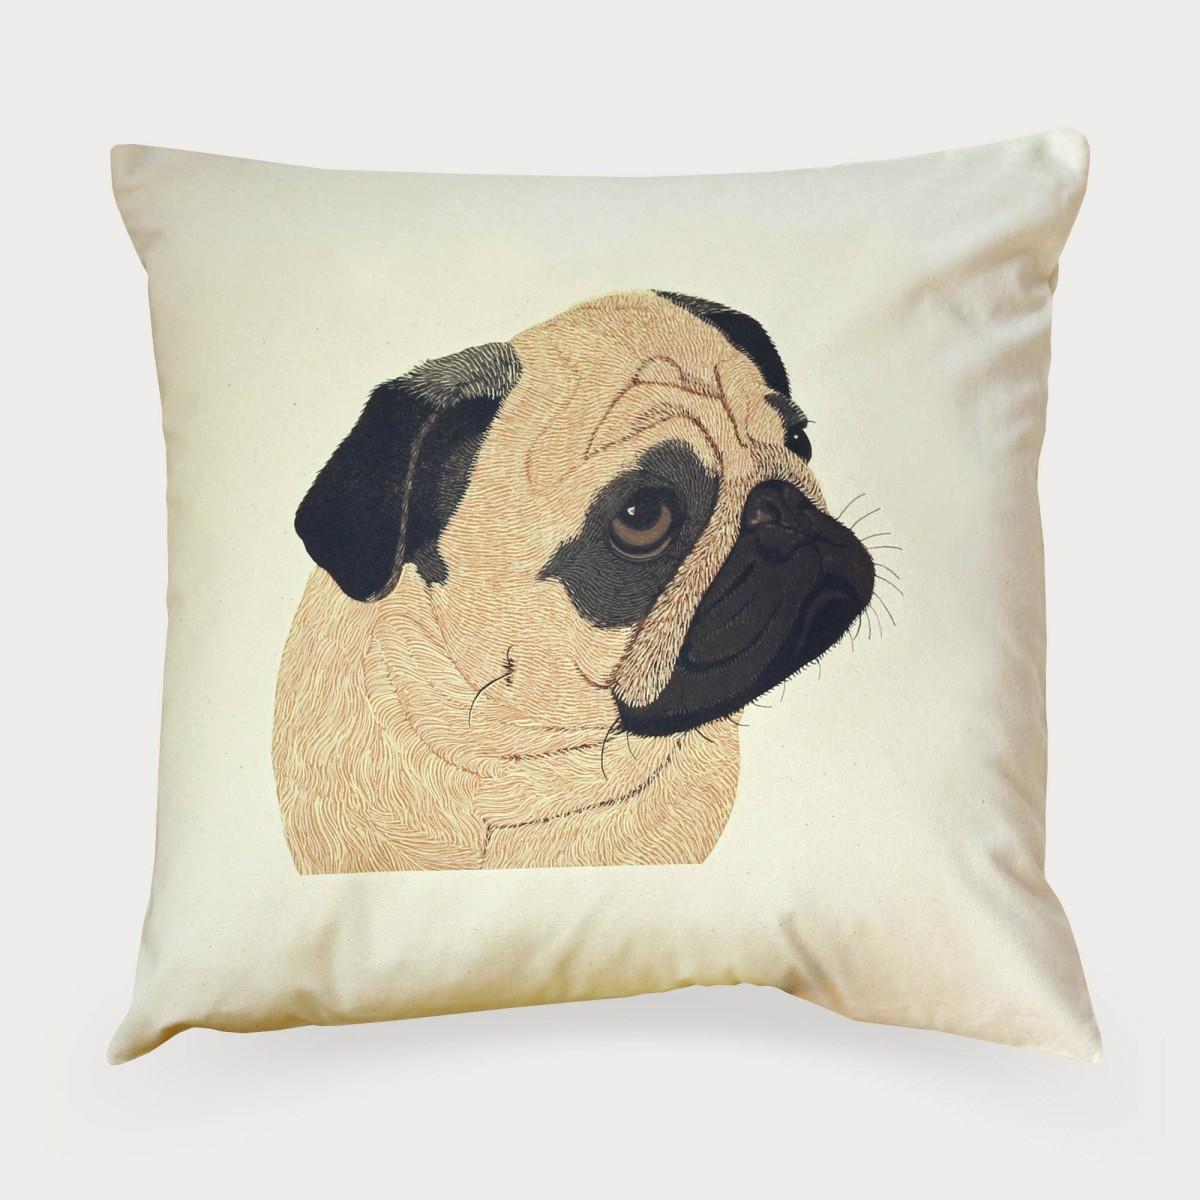 Pug Dog Print Cushion Cover